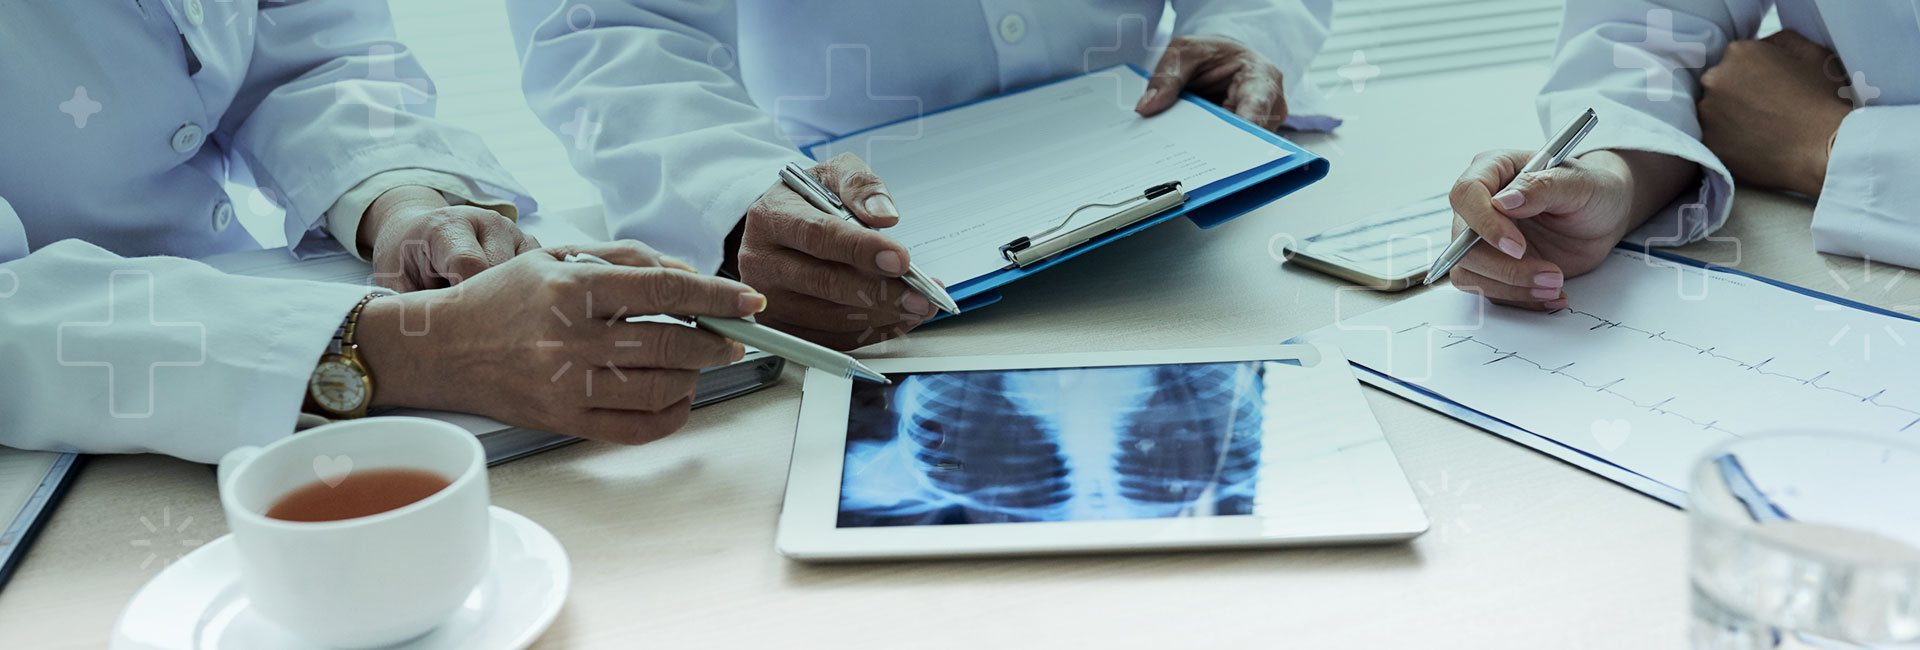 prevención tuberculosis